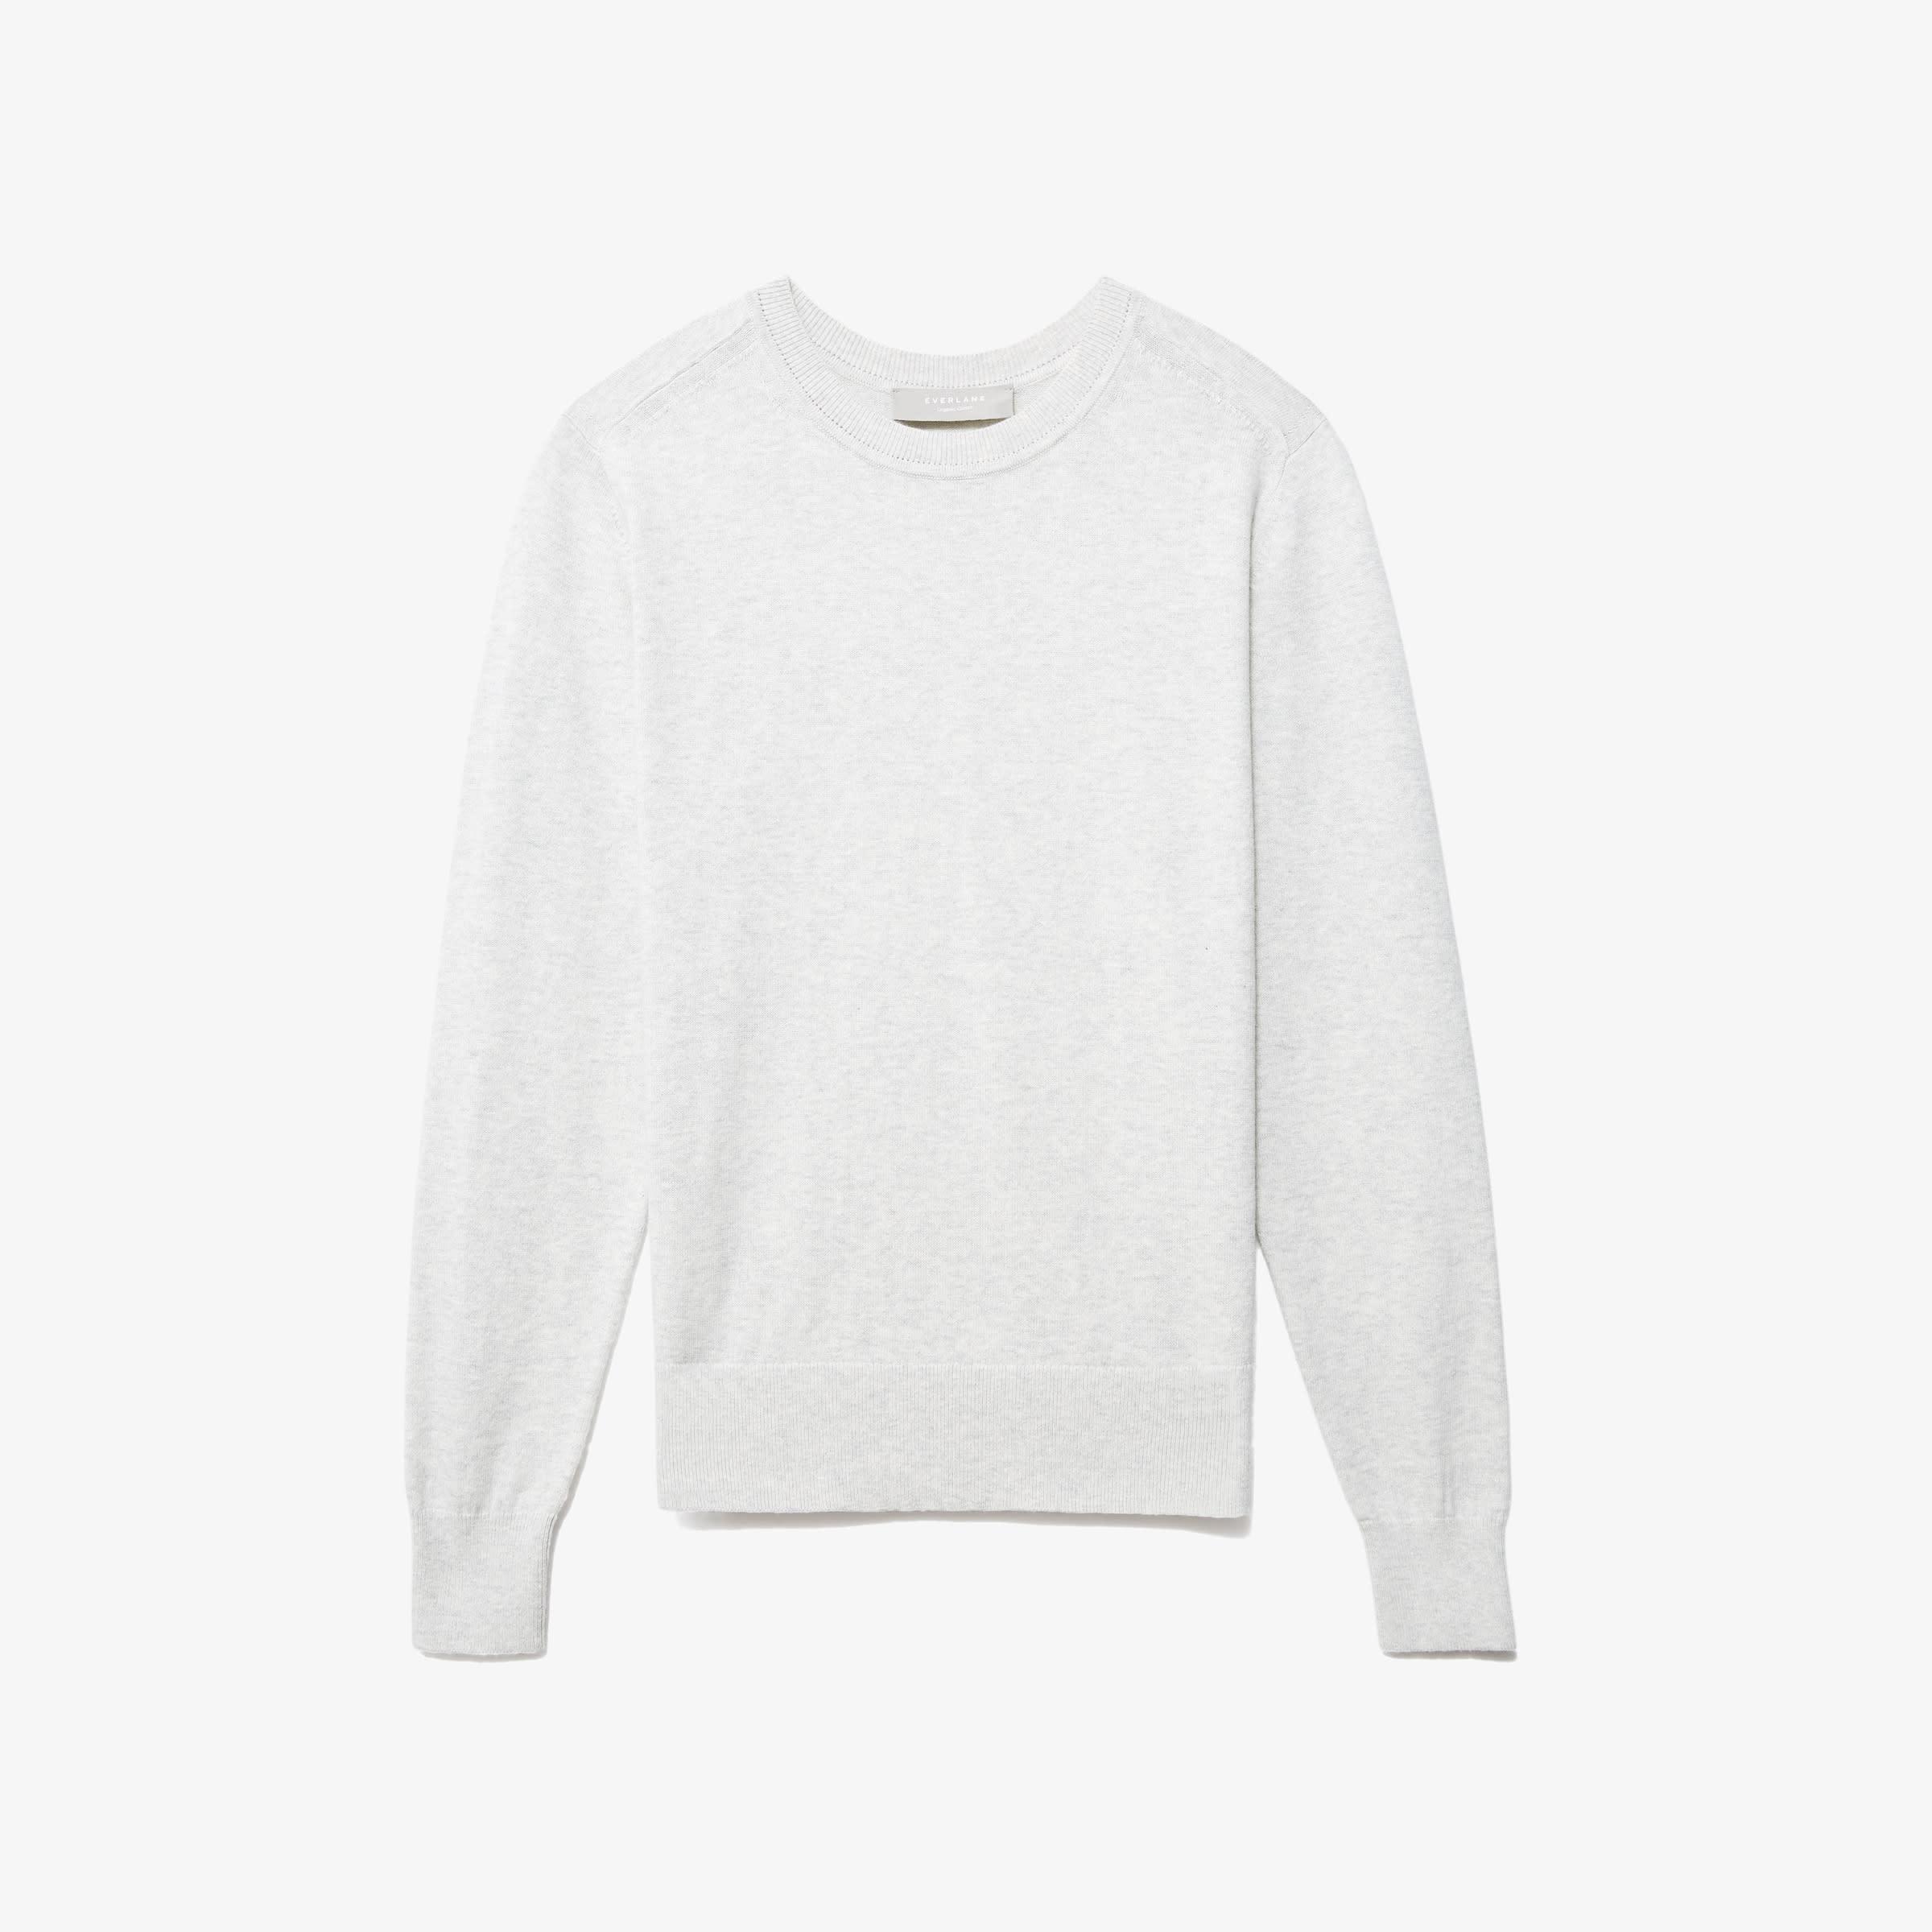 The Organic Cotton Crewneck Sweater | Everlane